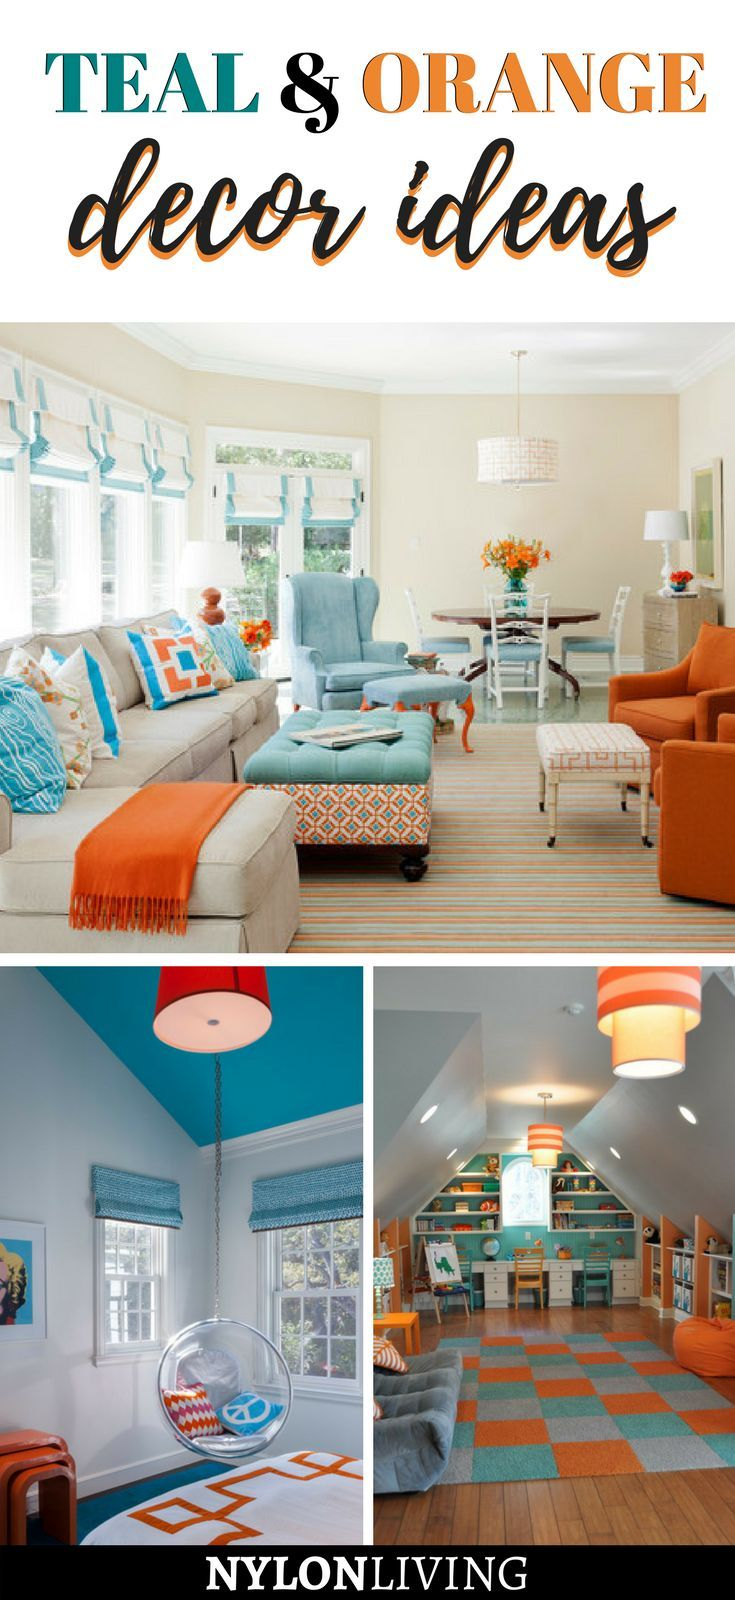 Teal And Orange Decor Teal Decor Teal Living Room Ideas Turquoise Room Decor Living Room Orange Teal Living Rooms Living Room Decor Orange